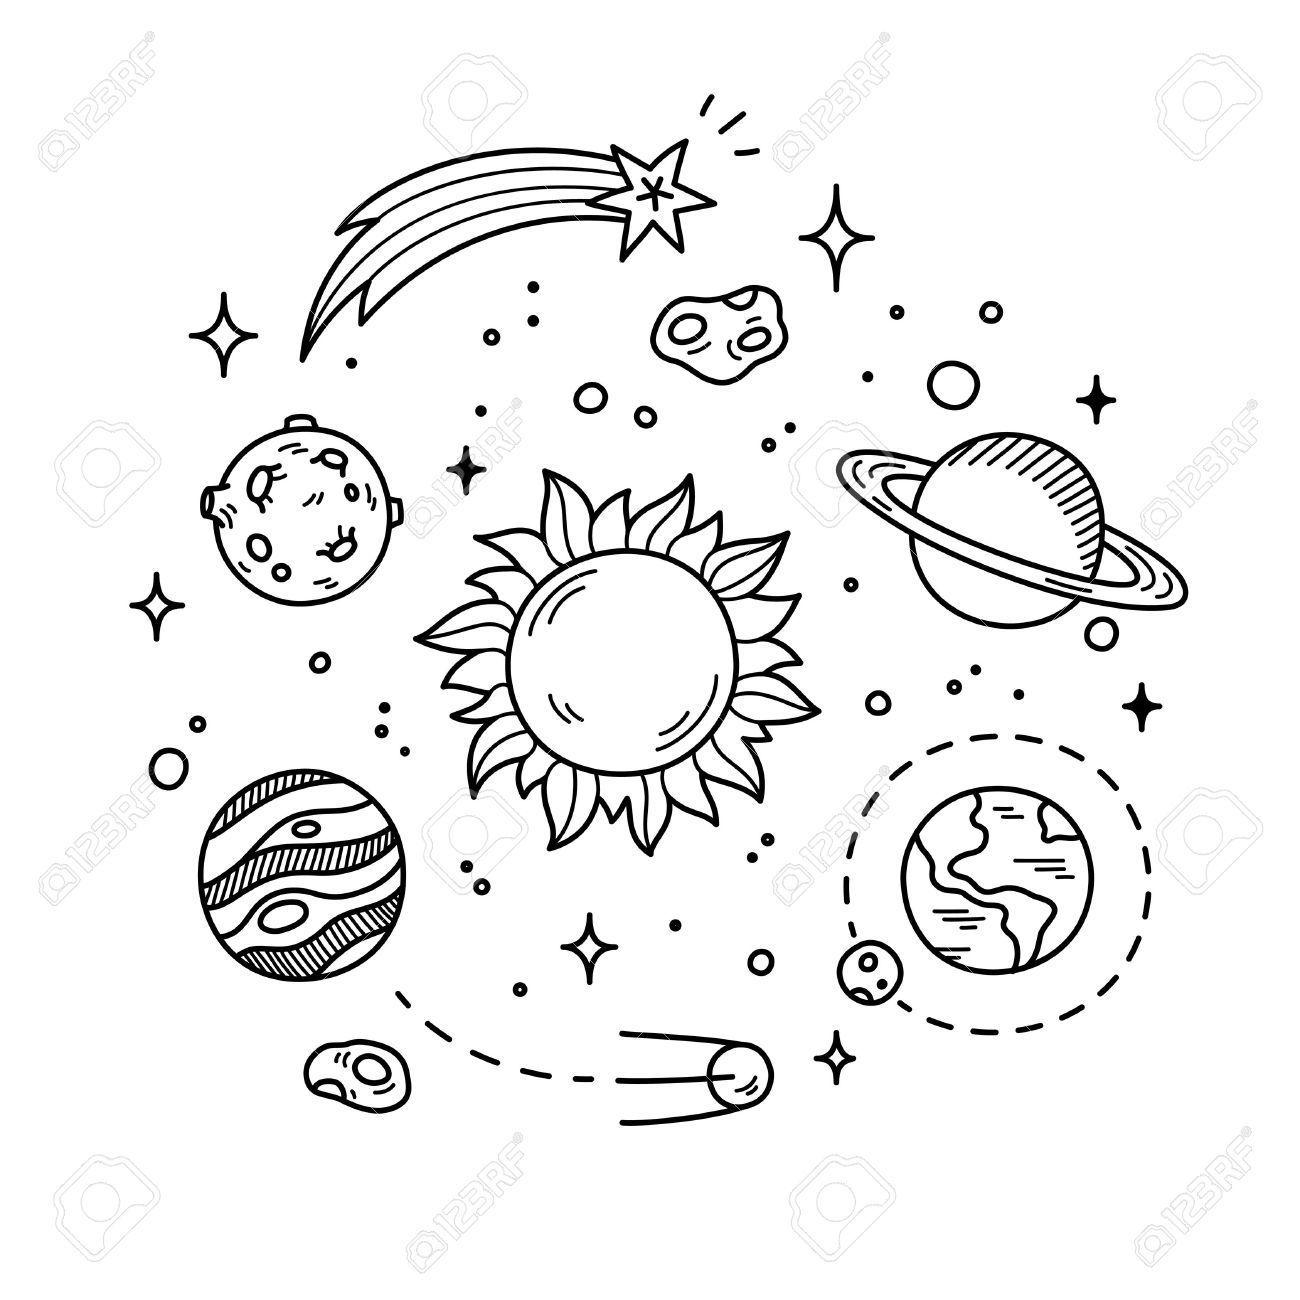 Silhouette System Solarsolar System Silhouette